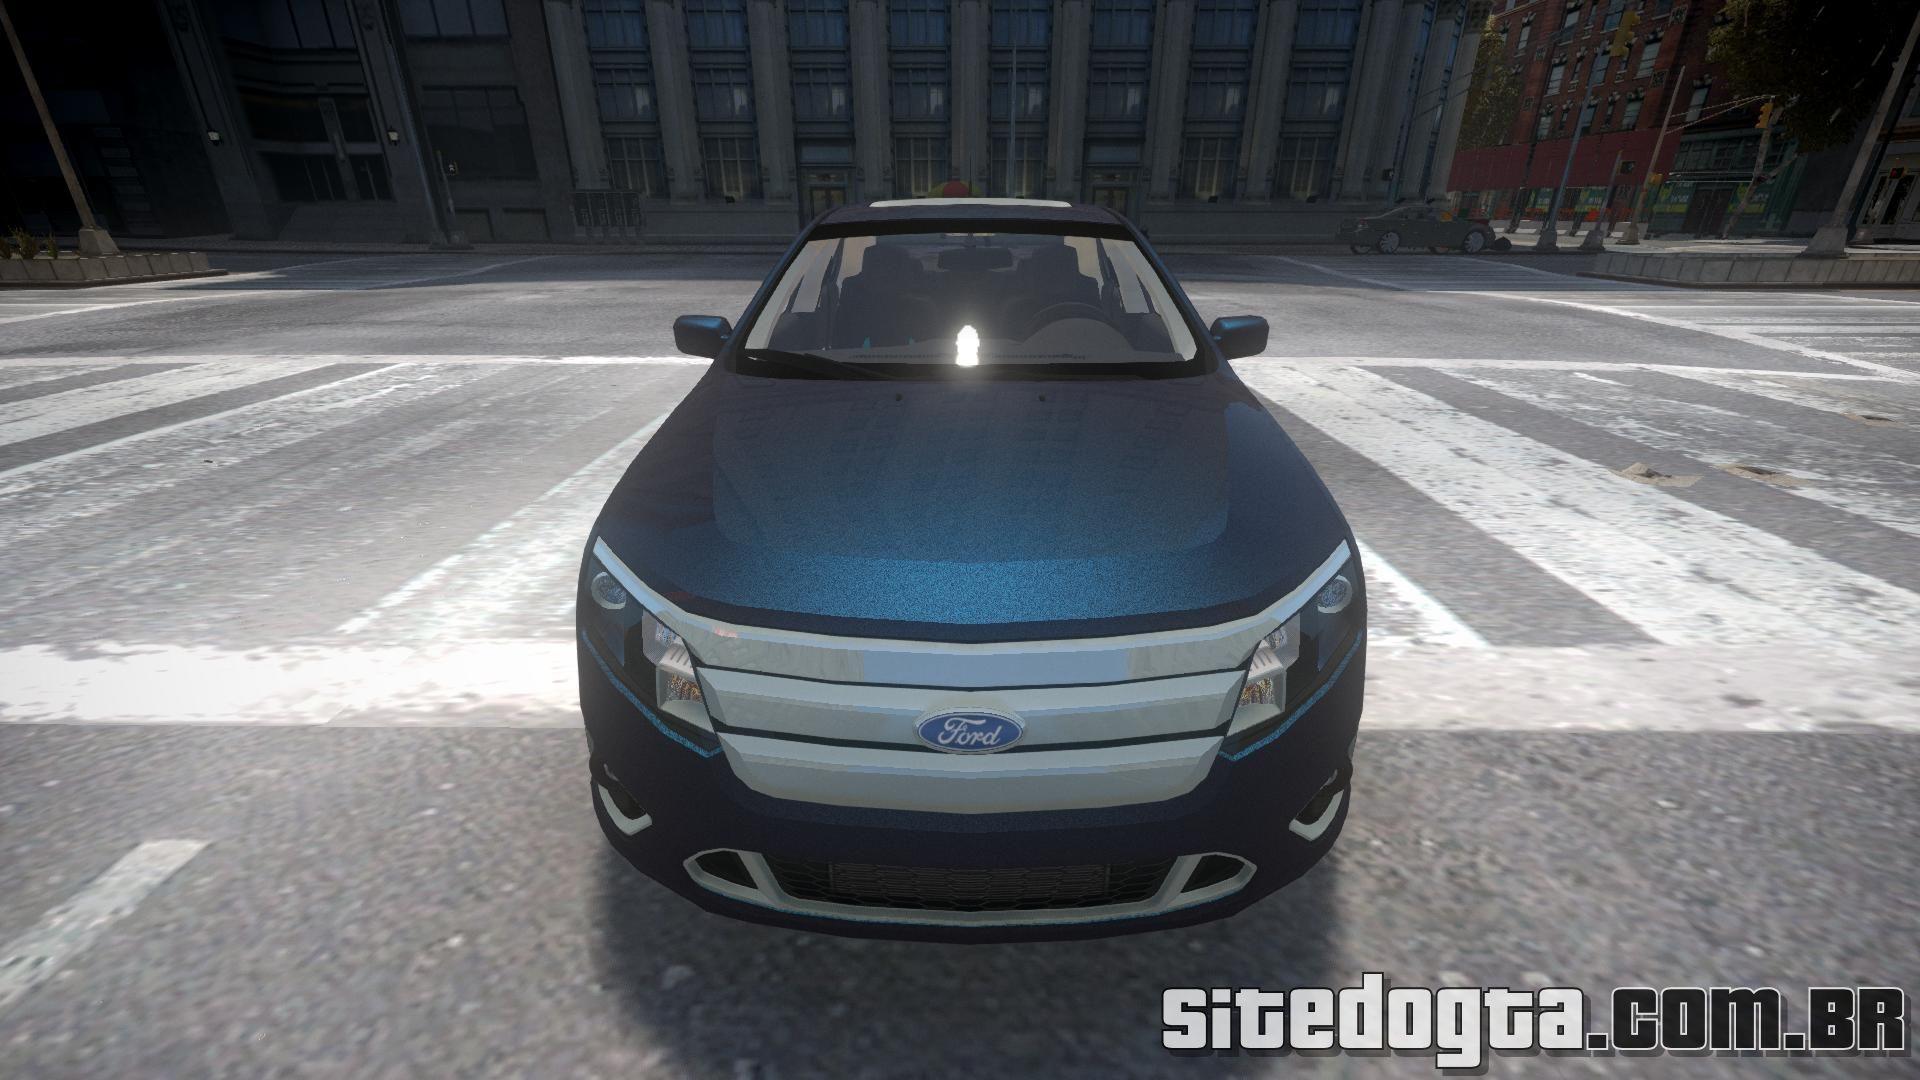 Ford Fusion Sport >> Ford Fusion Sport 2010 para GTA IV | Site do GTA